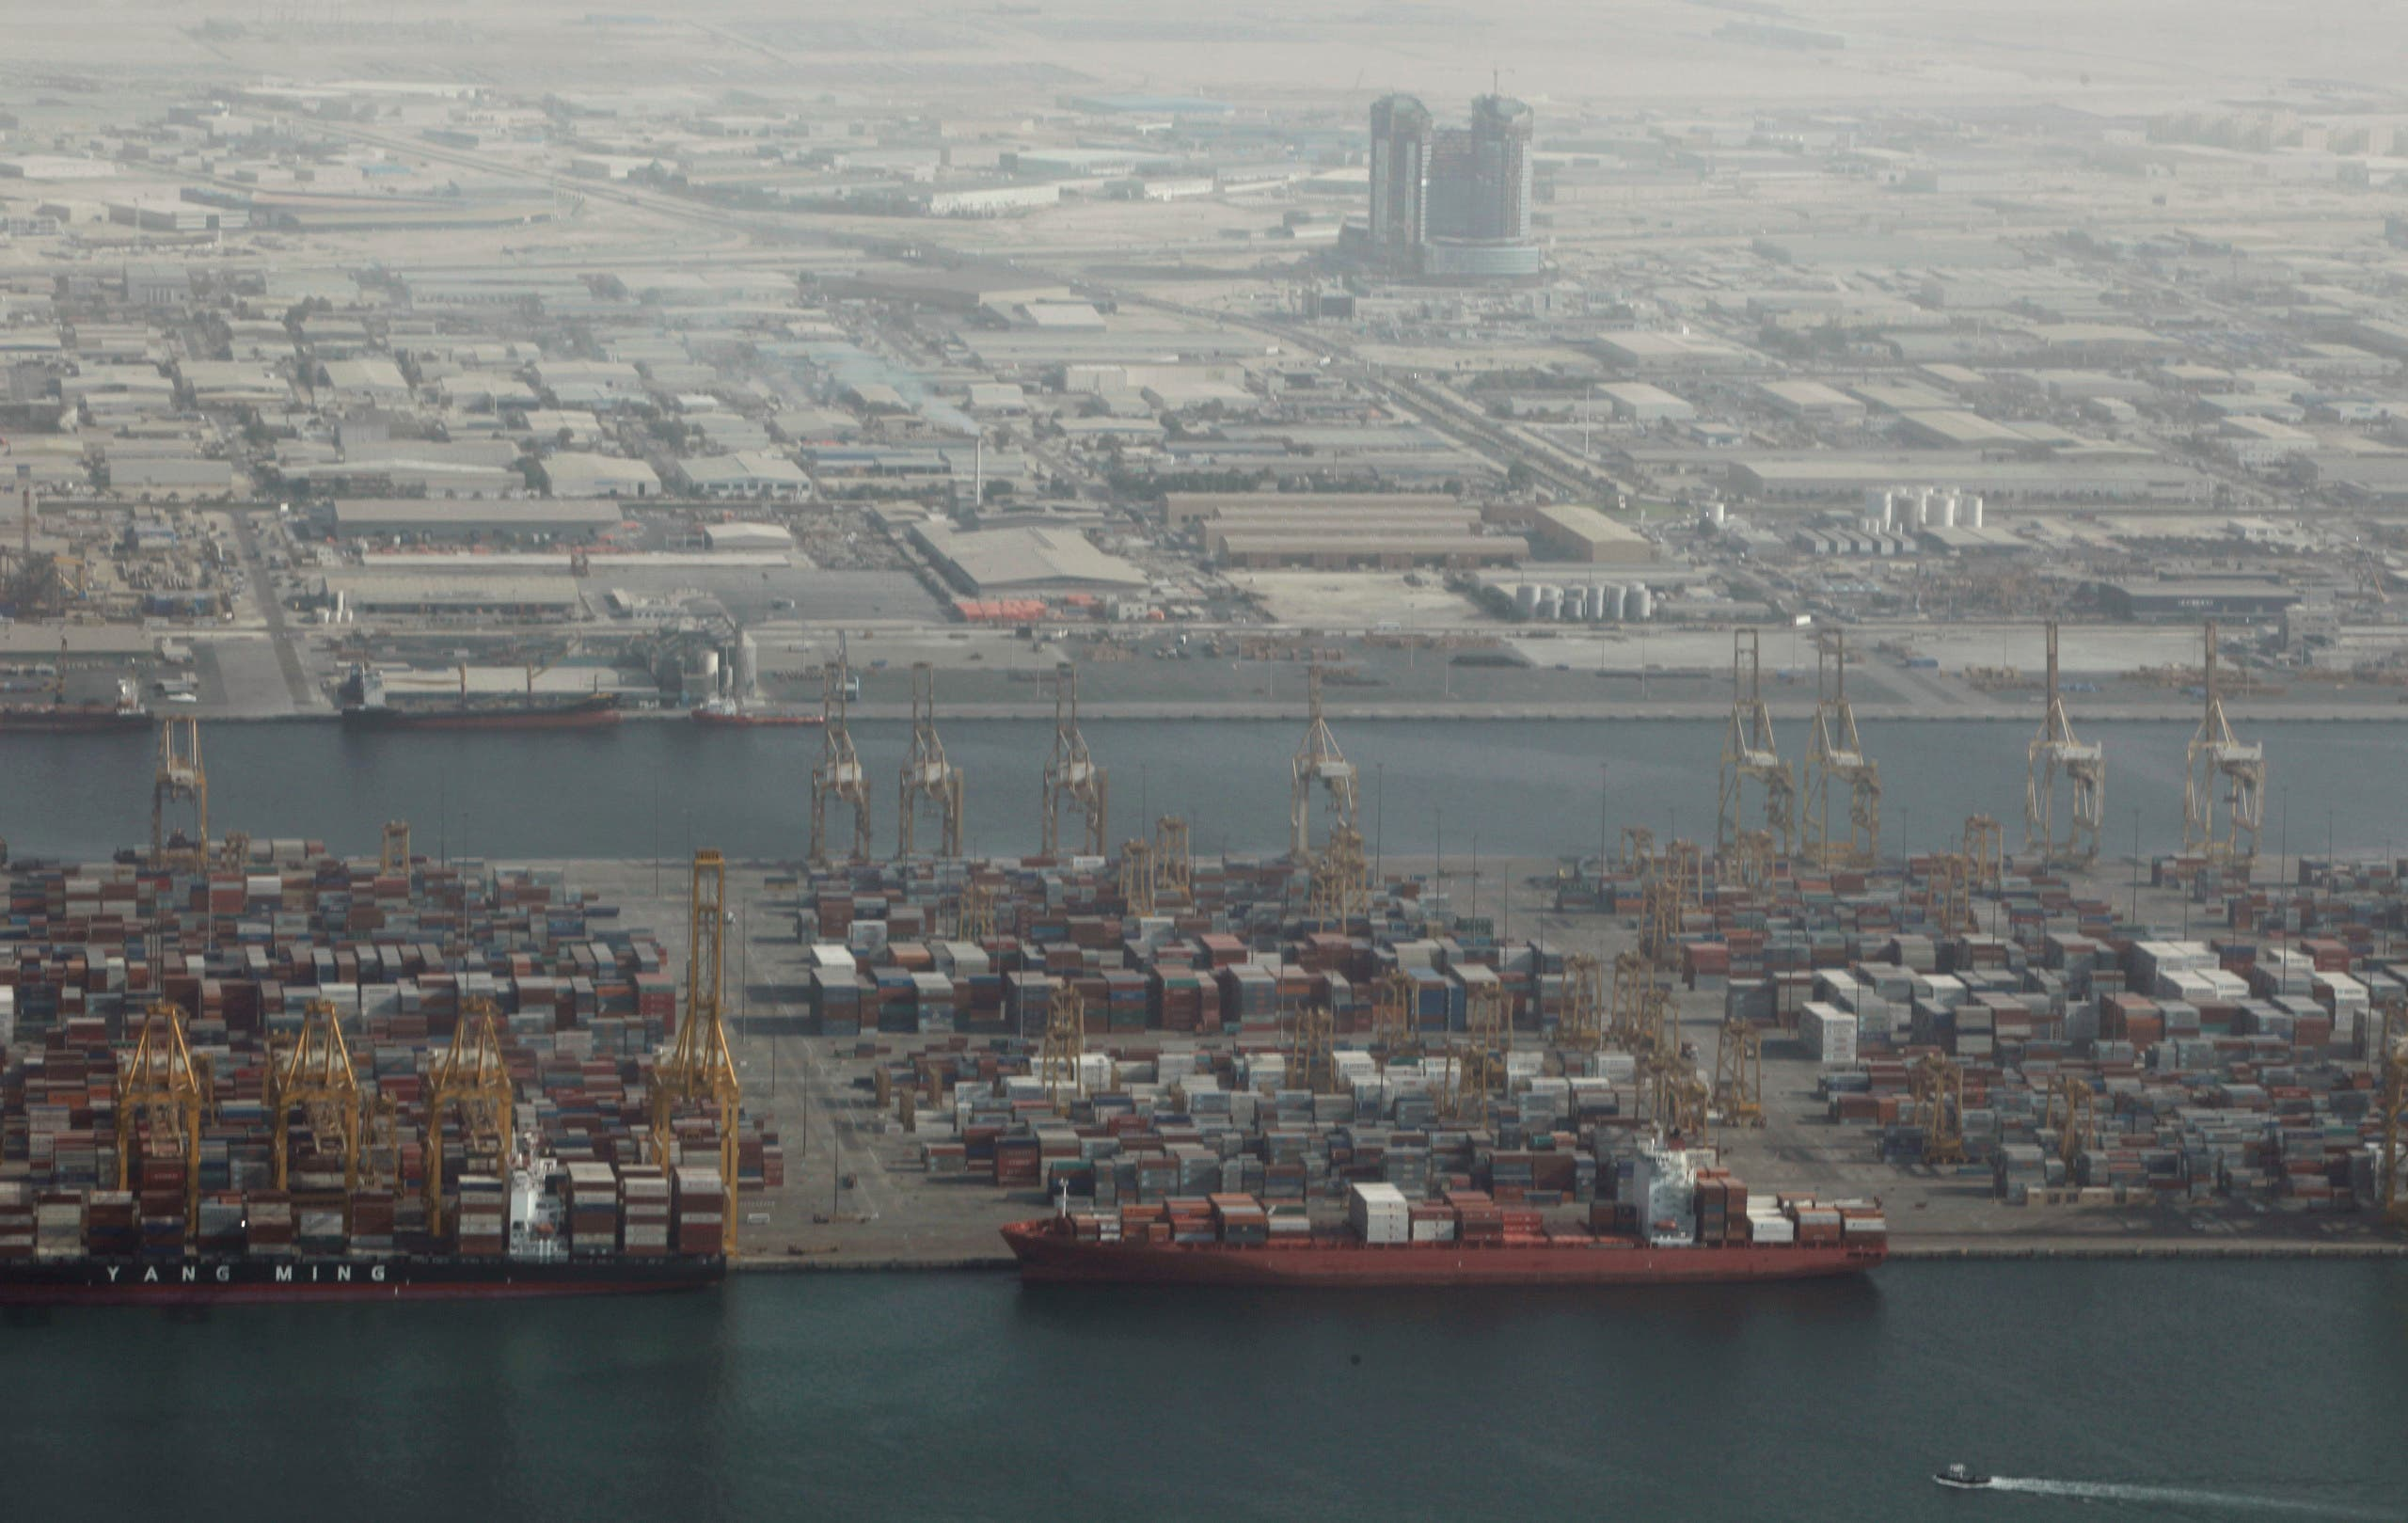 An aerial view of Jebel Ali Port in Dubai October 25, 2010. (Reuters)